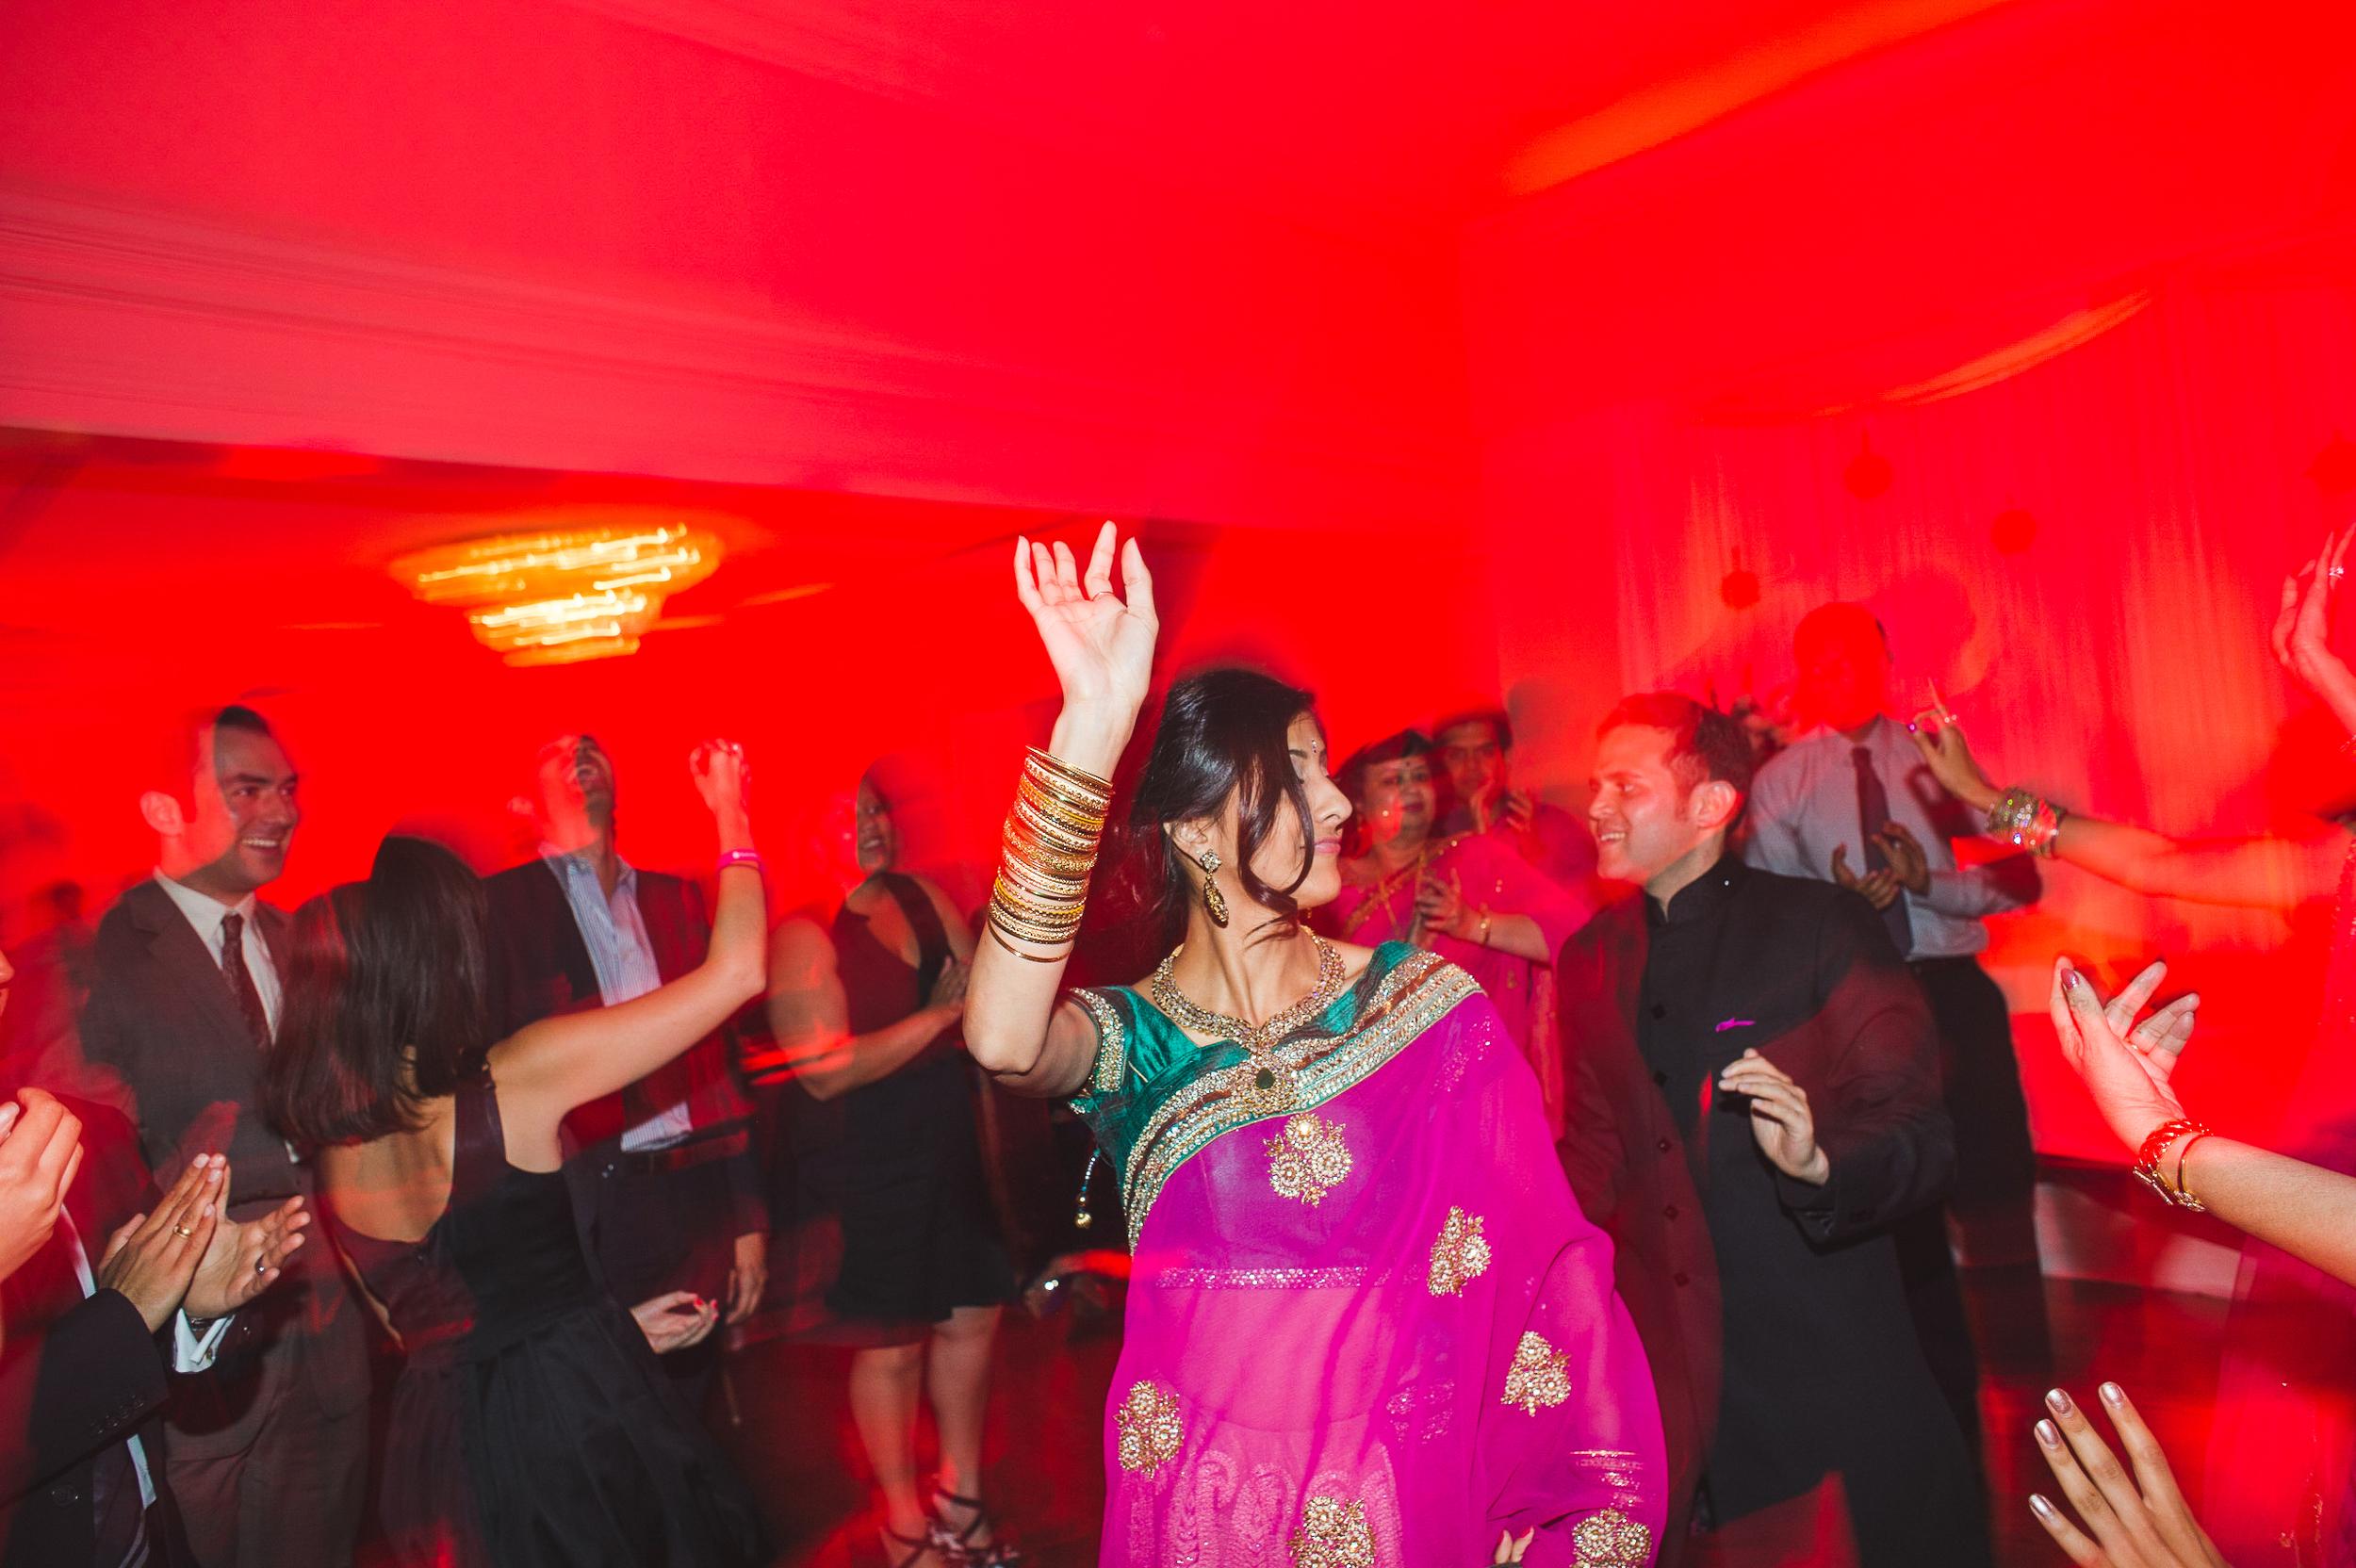 Indian wedding photographer washington dc Mantas Kubilinskas-16.jpg